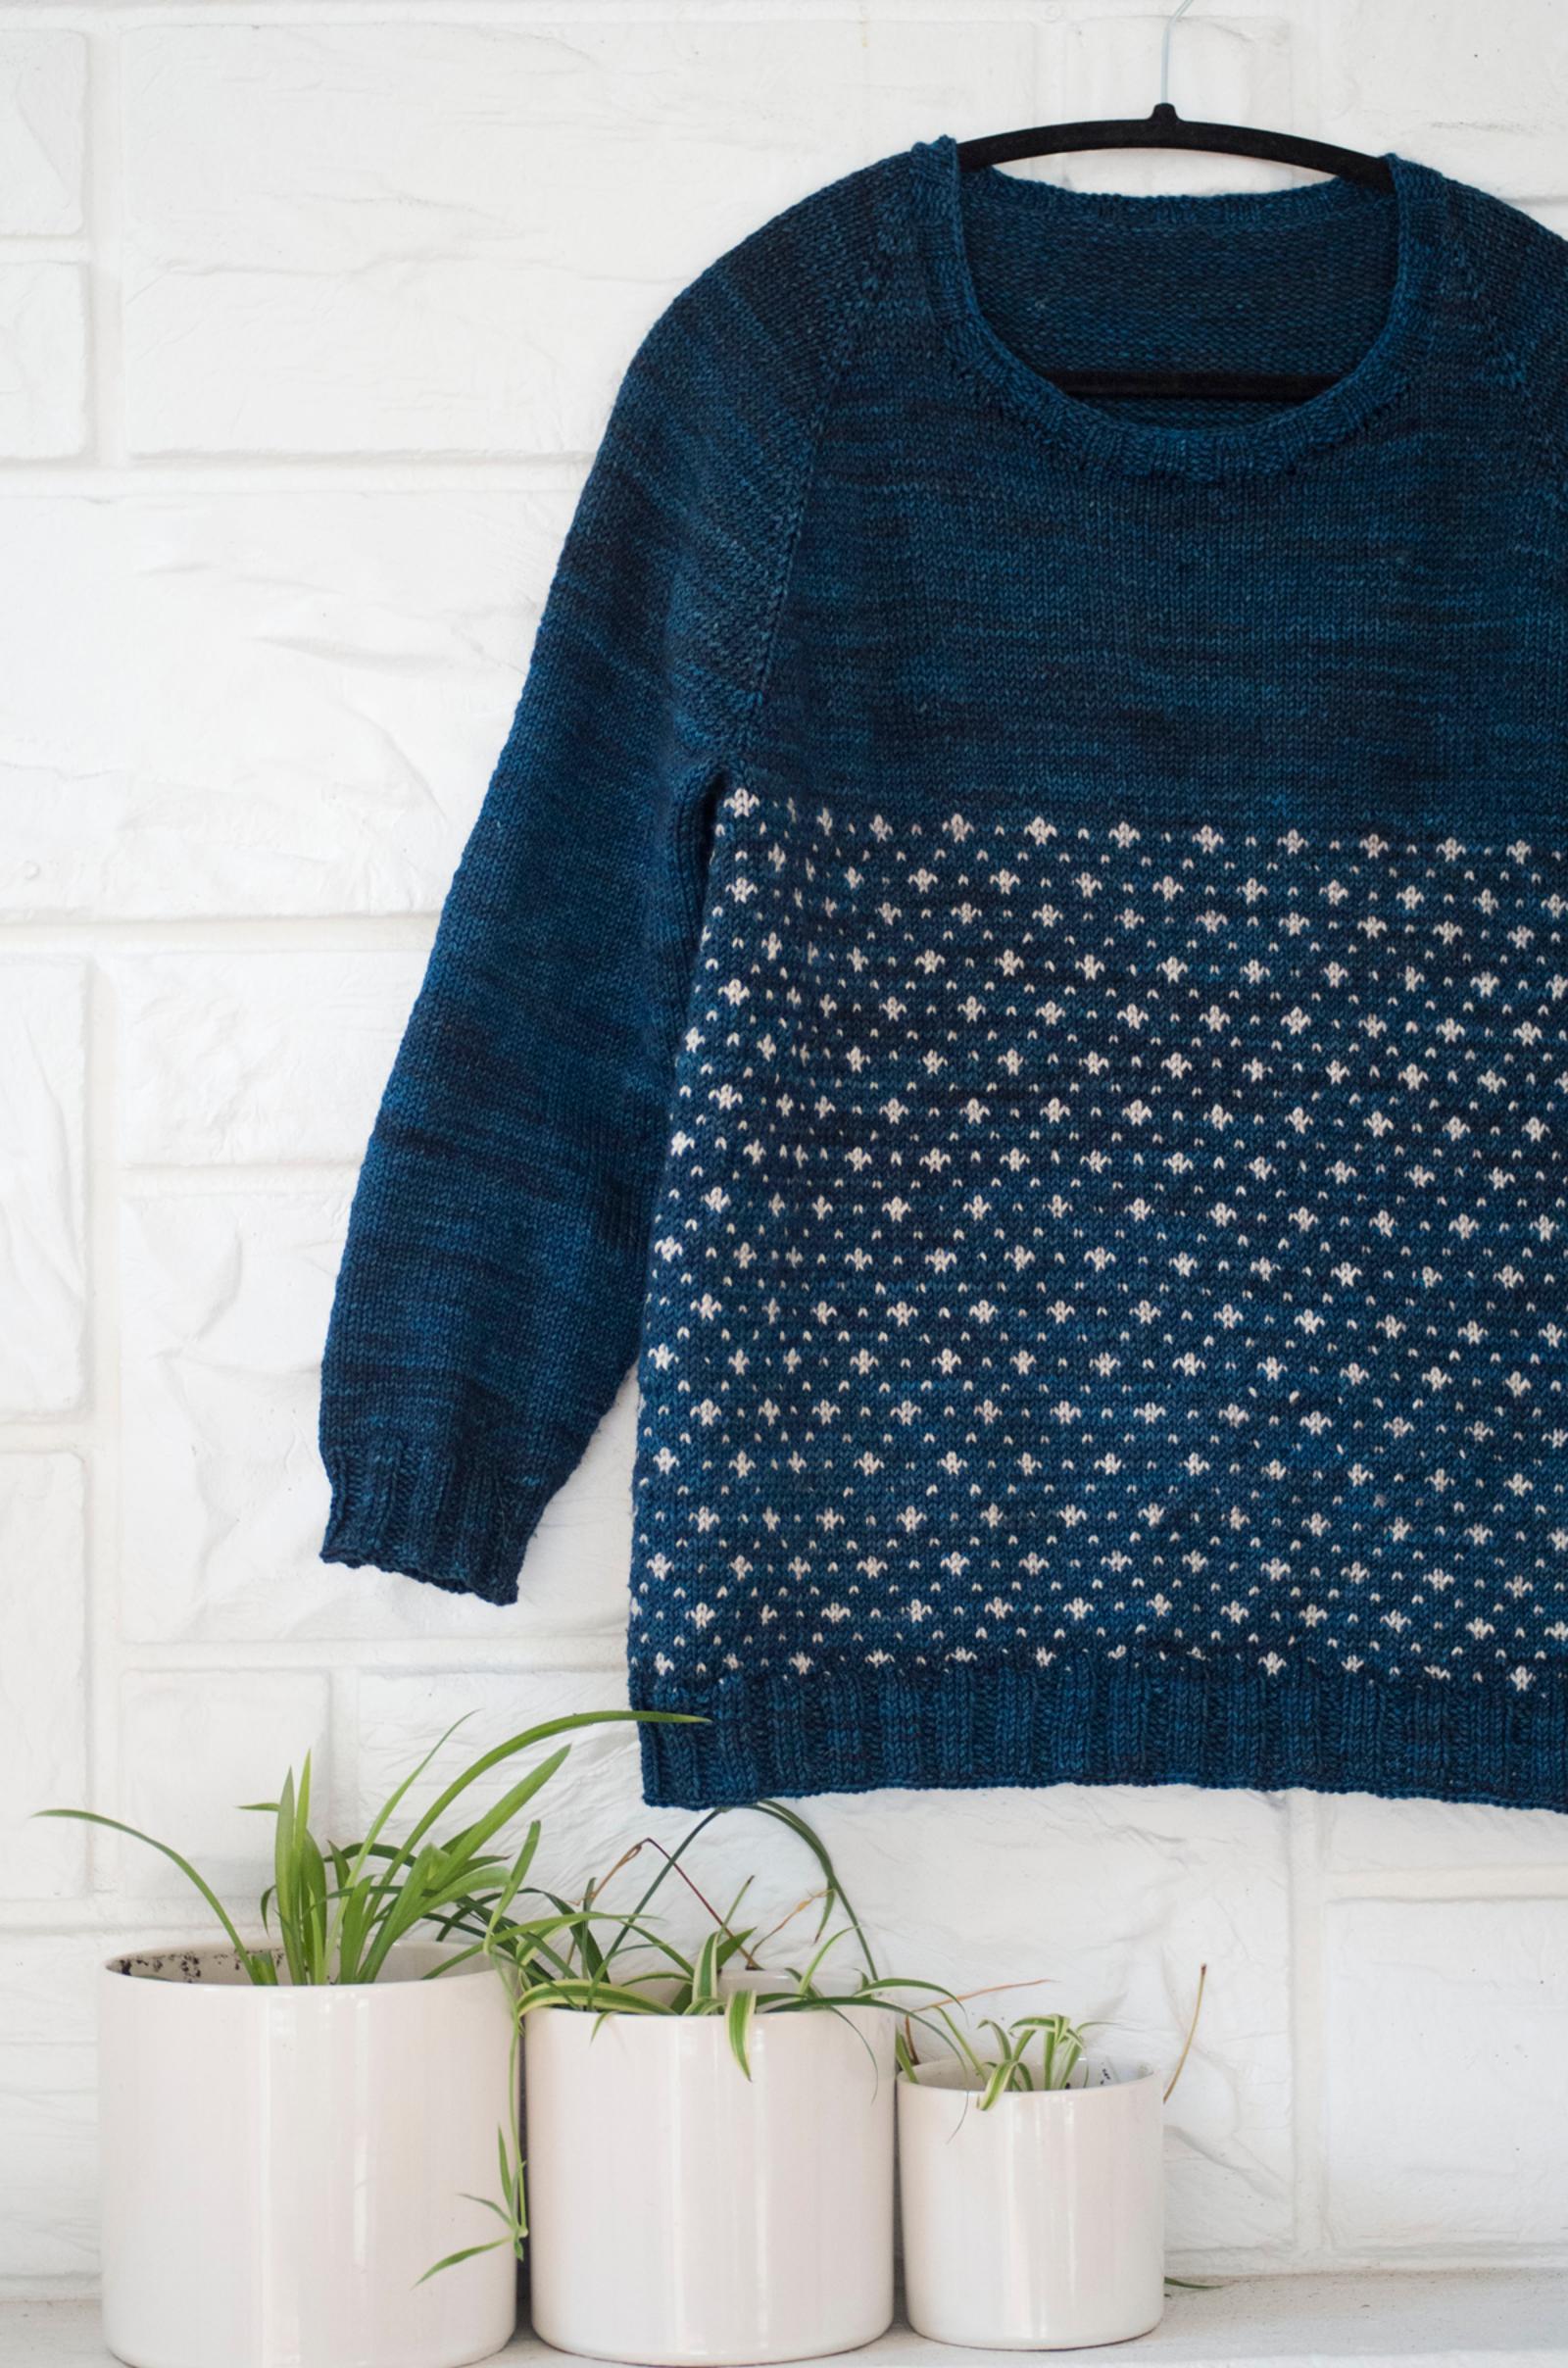 Snowfall Knitting Pattern